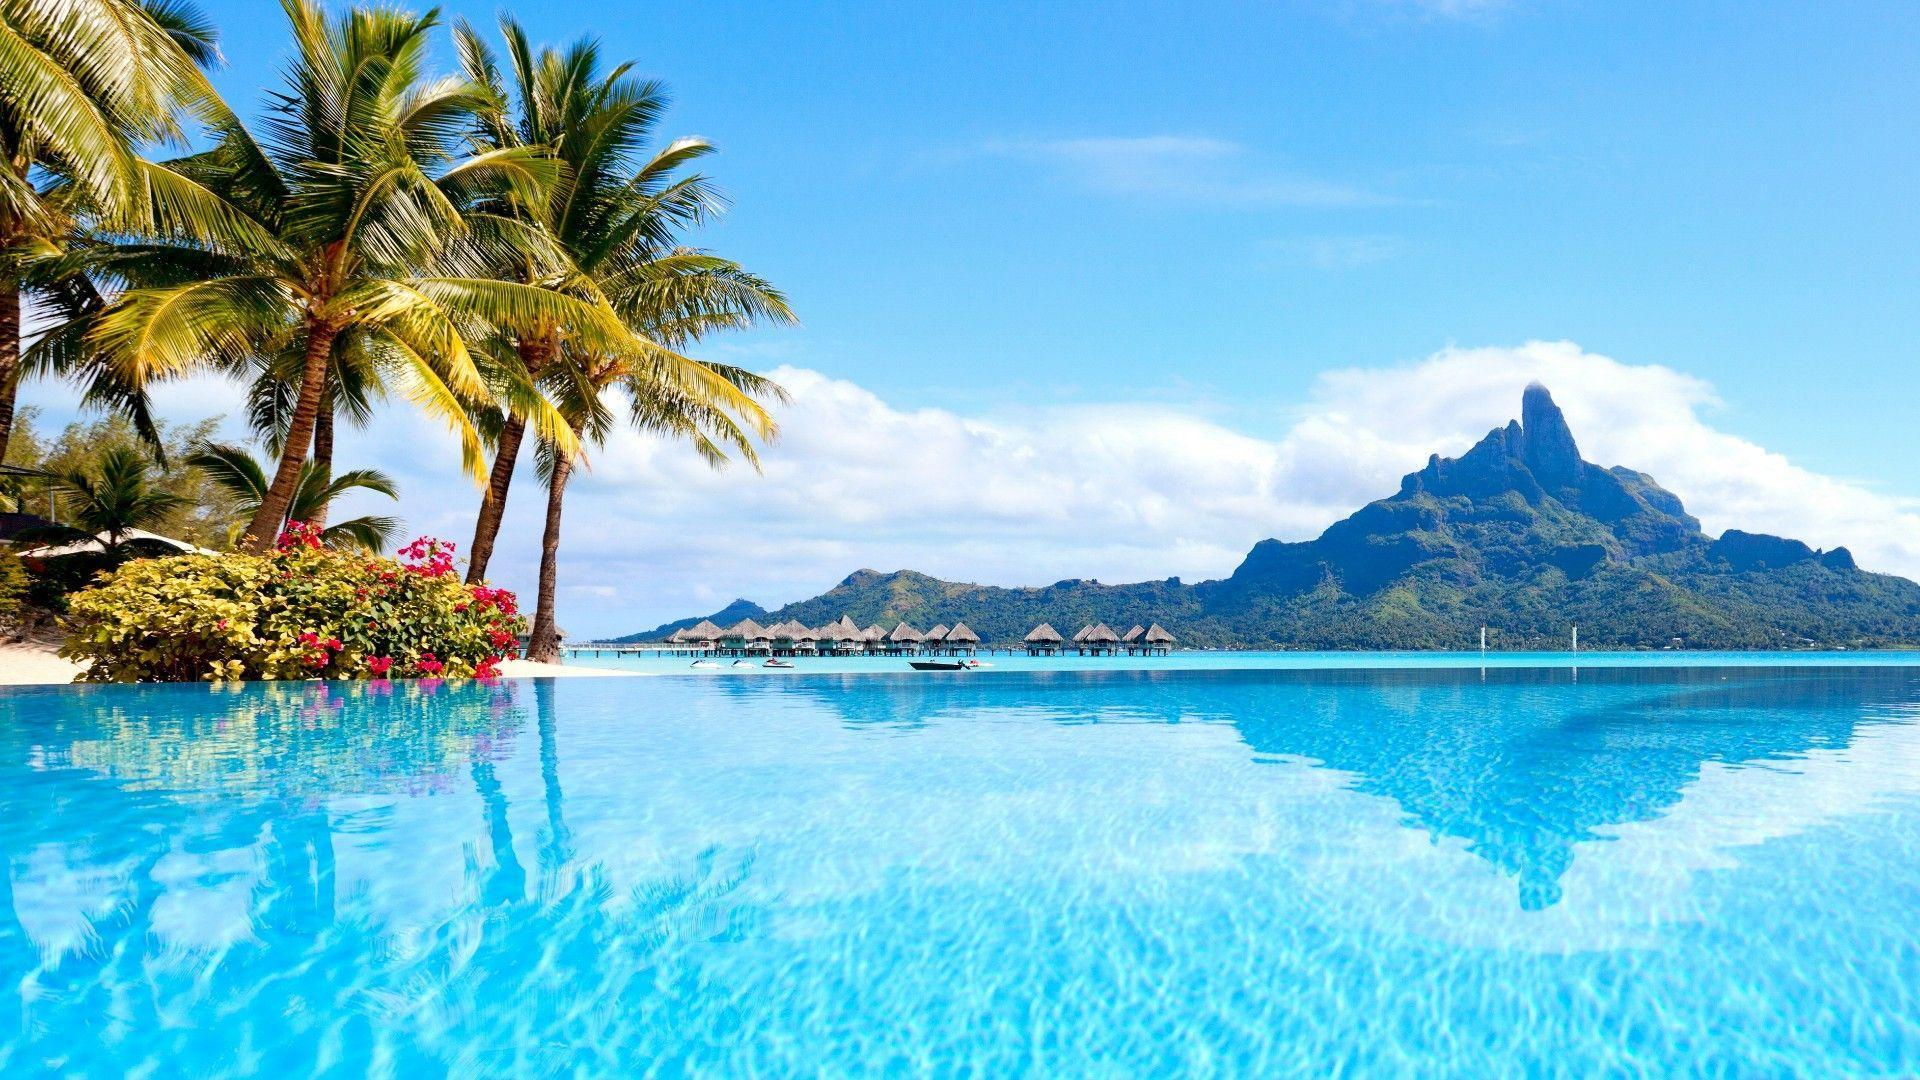 Bora Bora Windows Wallpapers Top Free Bora Bora Windows